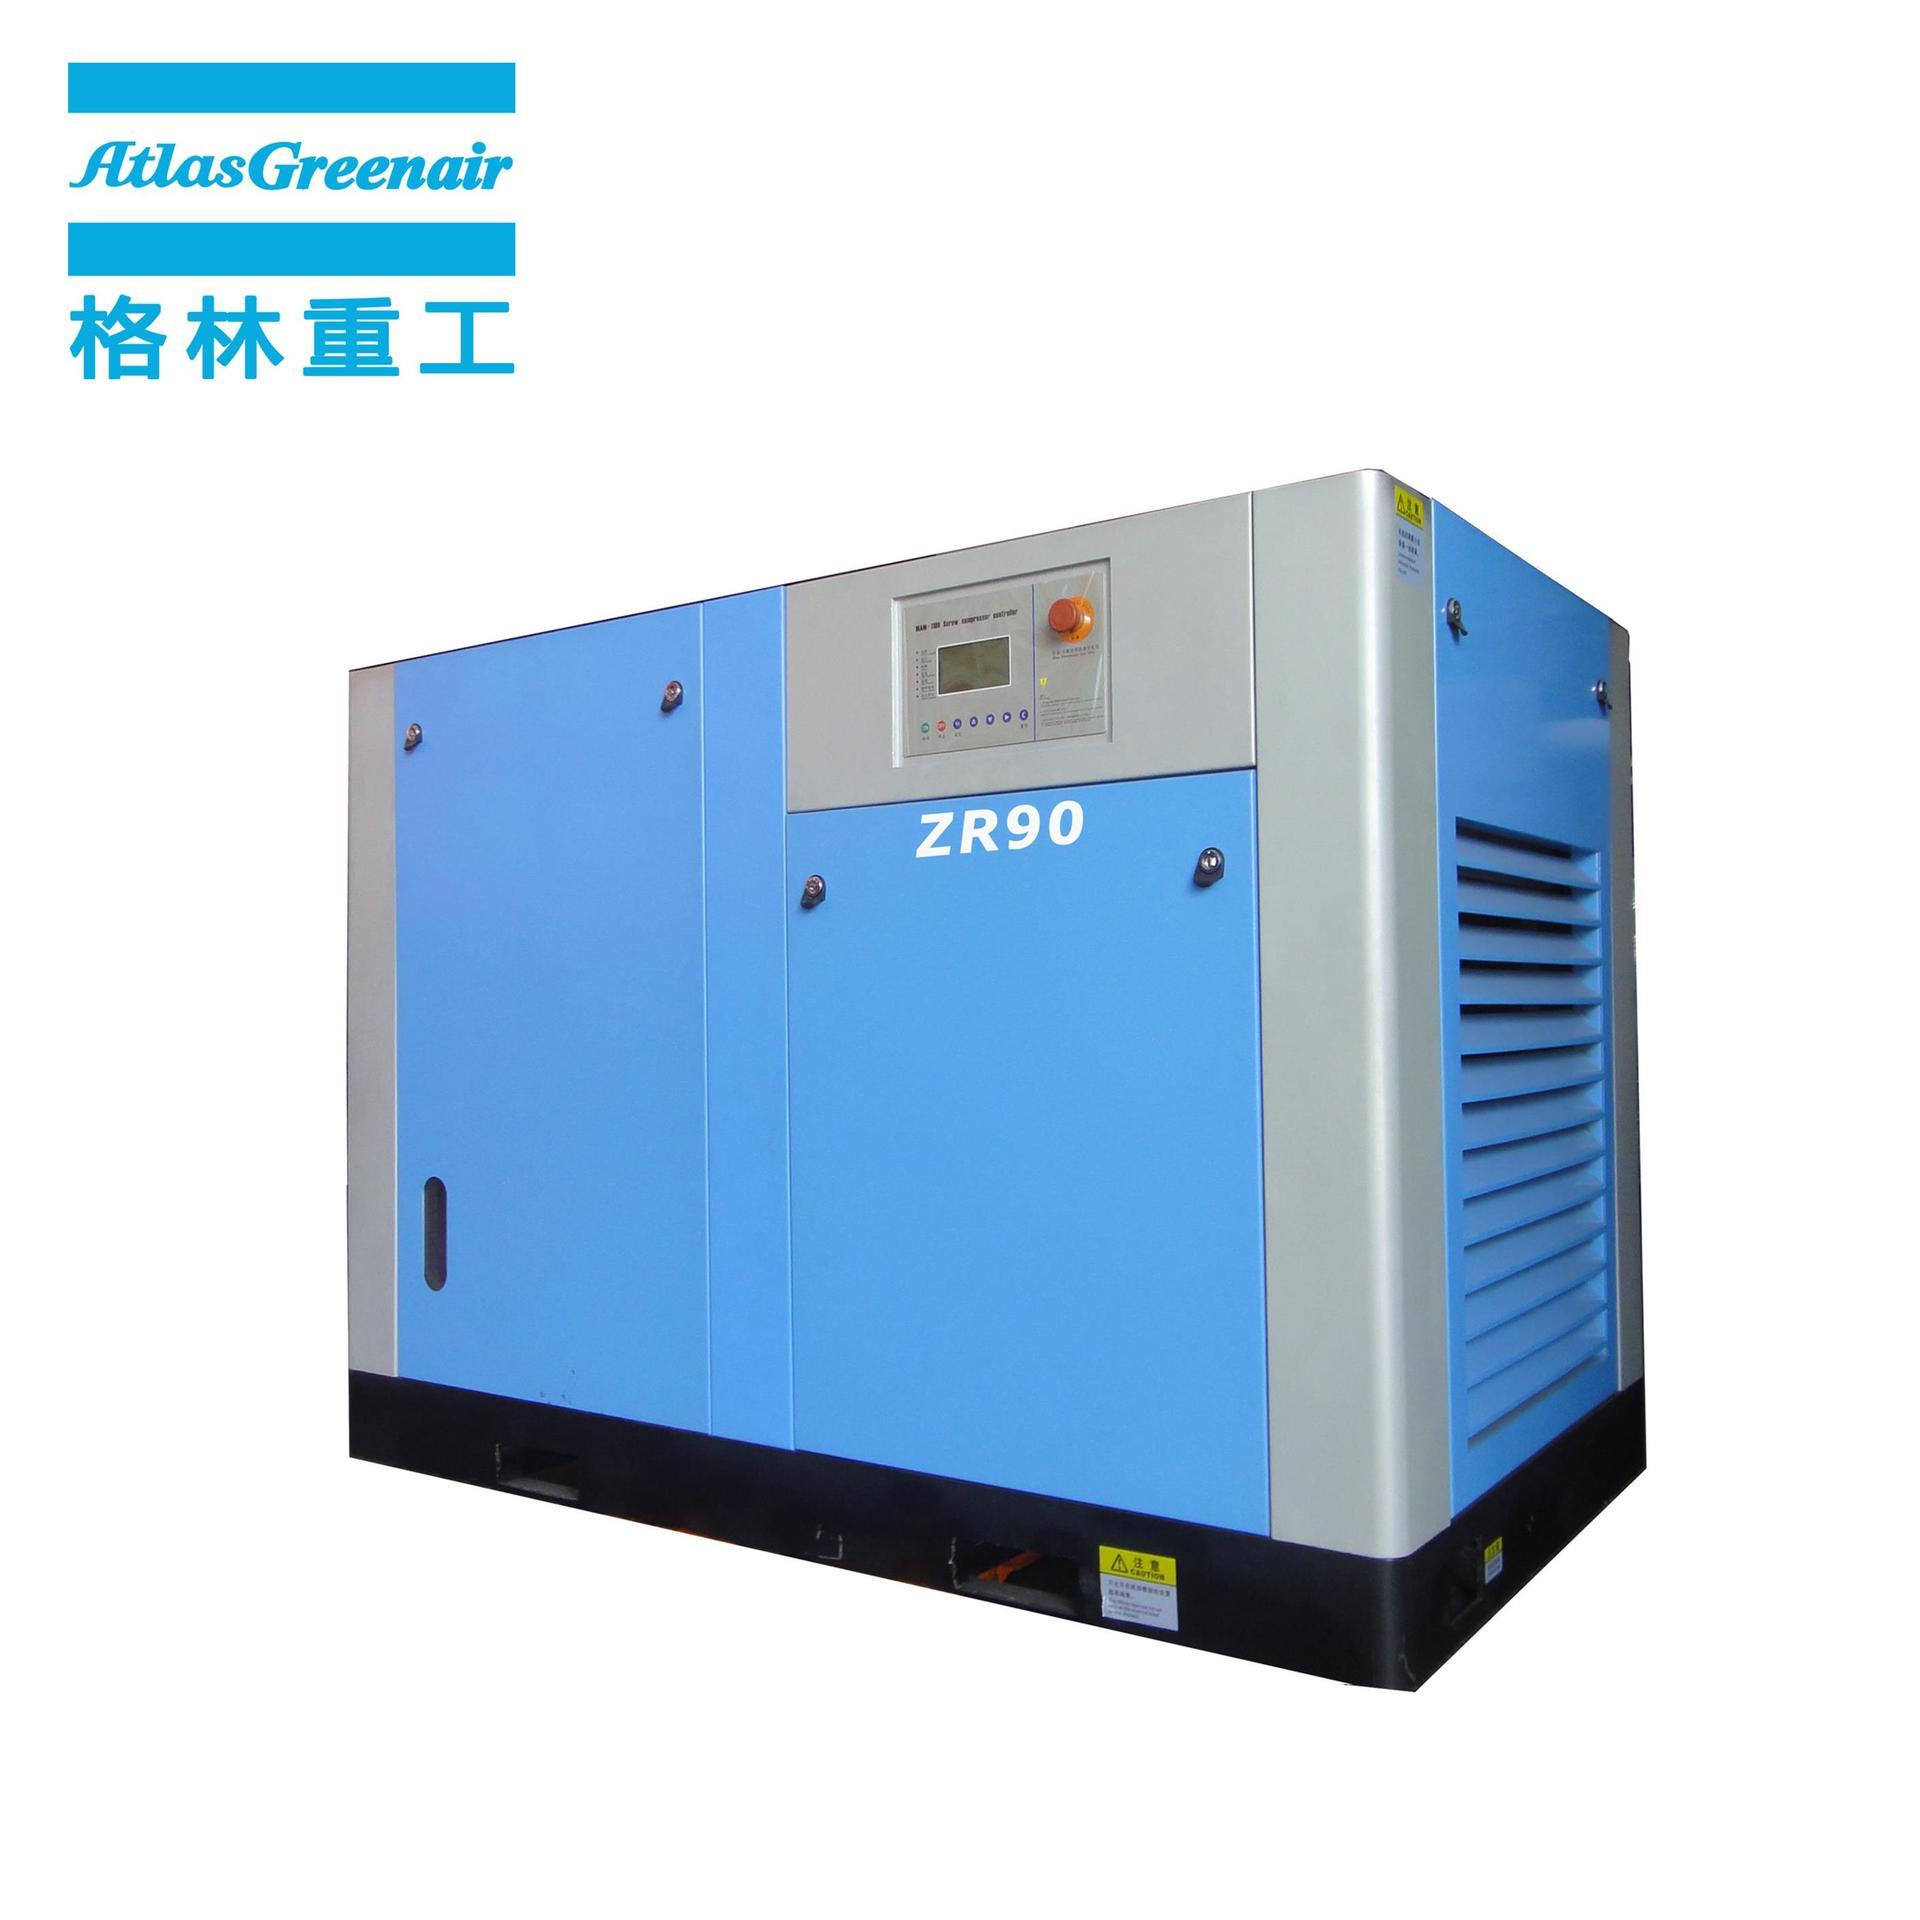 Atlas Greenair ZR90 Water Cooled Oil Free Air Compressor Screw